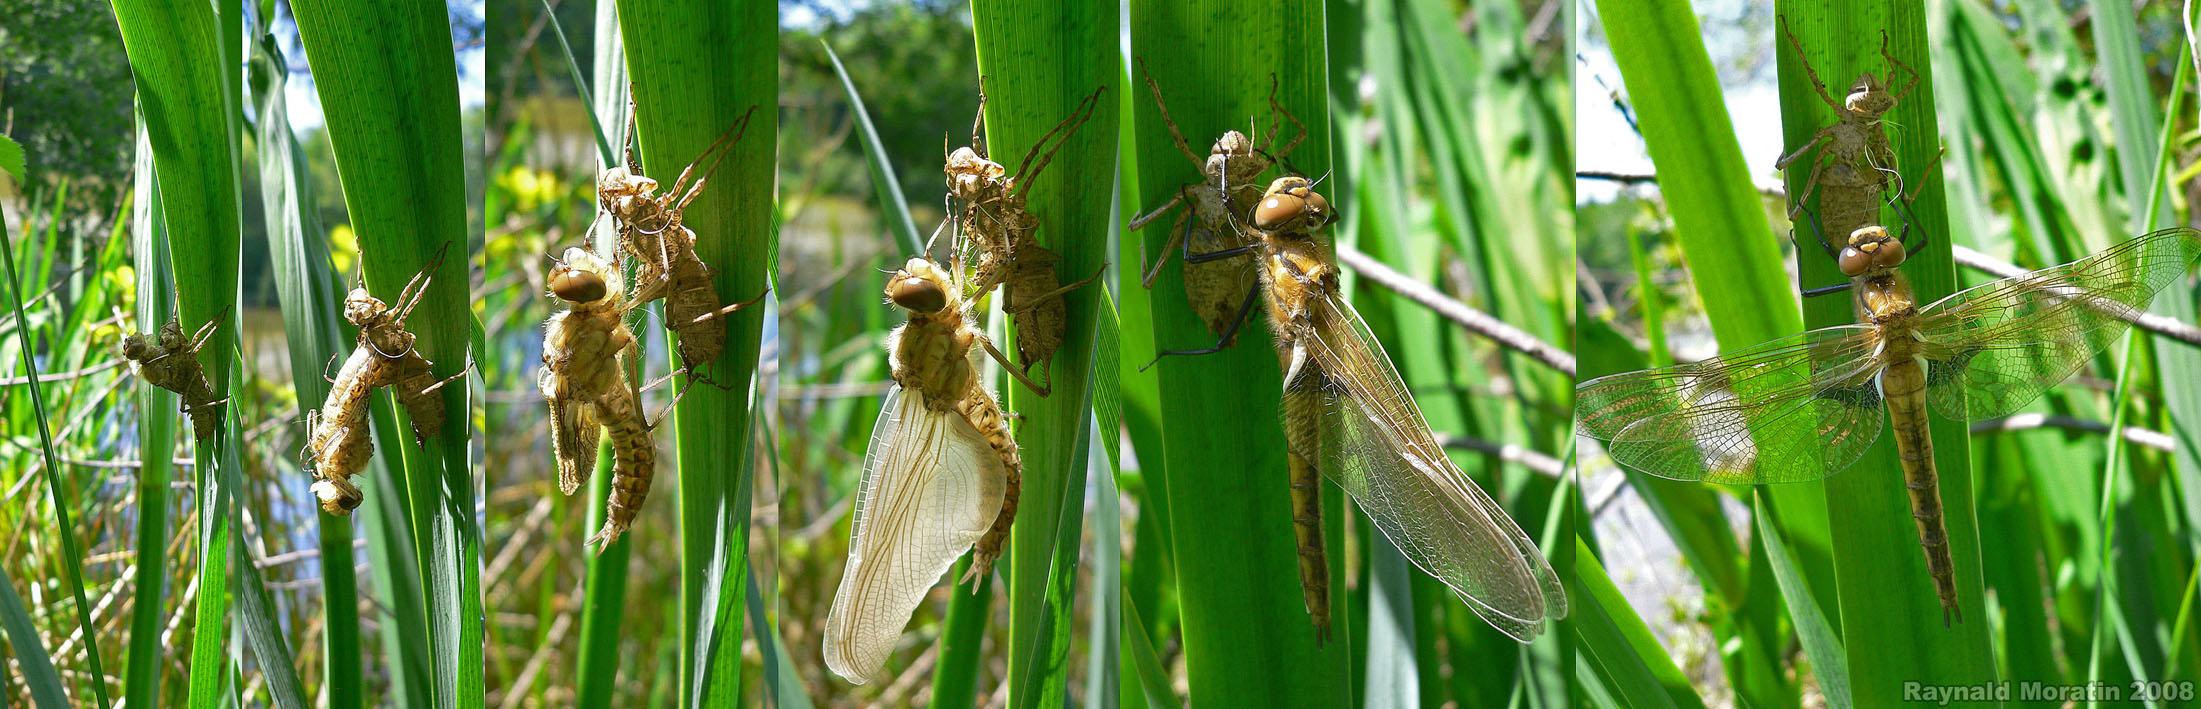 http://files.biolovision.net/www.faune-alsace.org/userfiles/Insectes/epitheca/EpiBimaRMoratincond.jpg